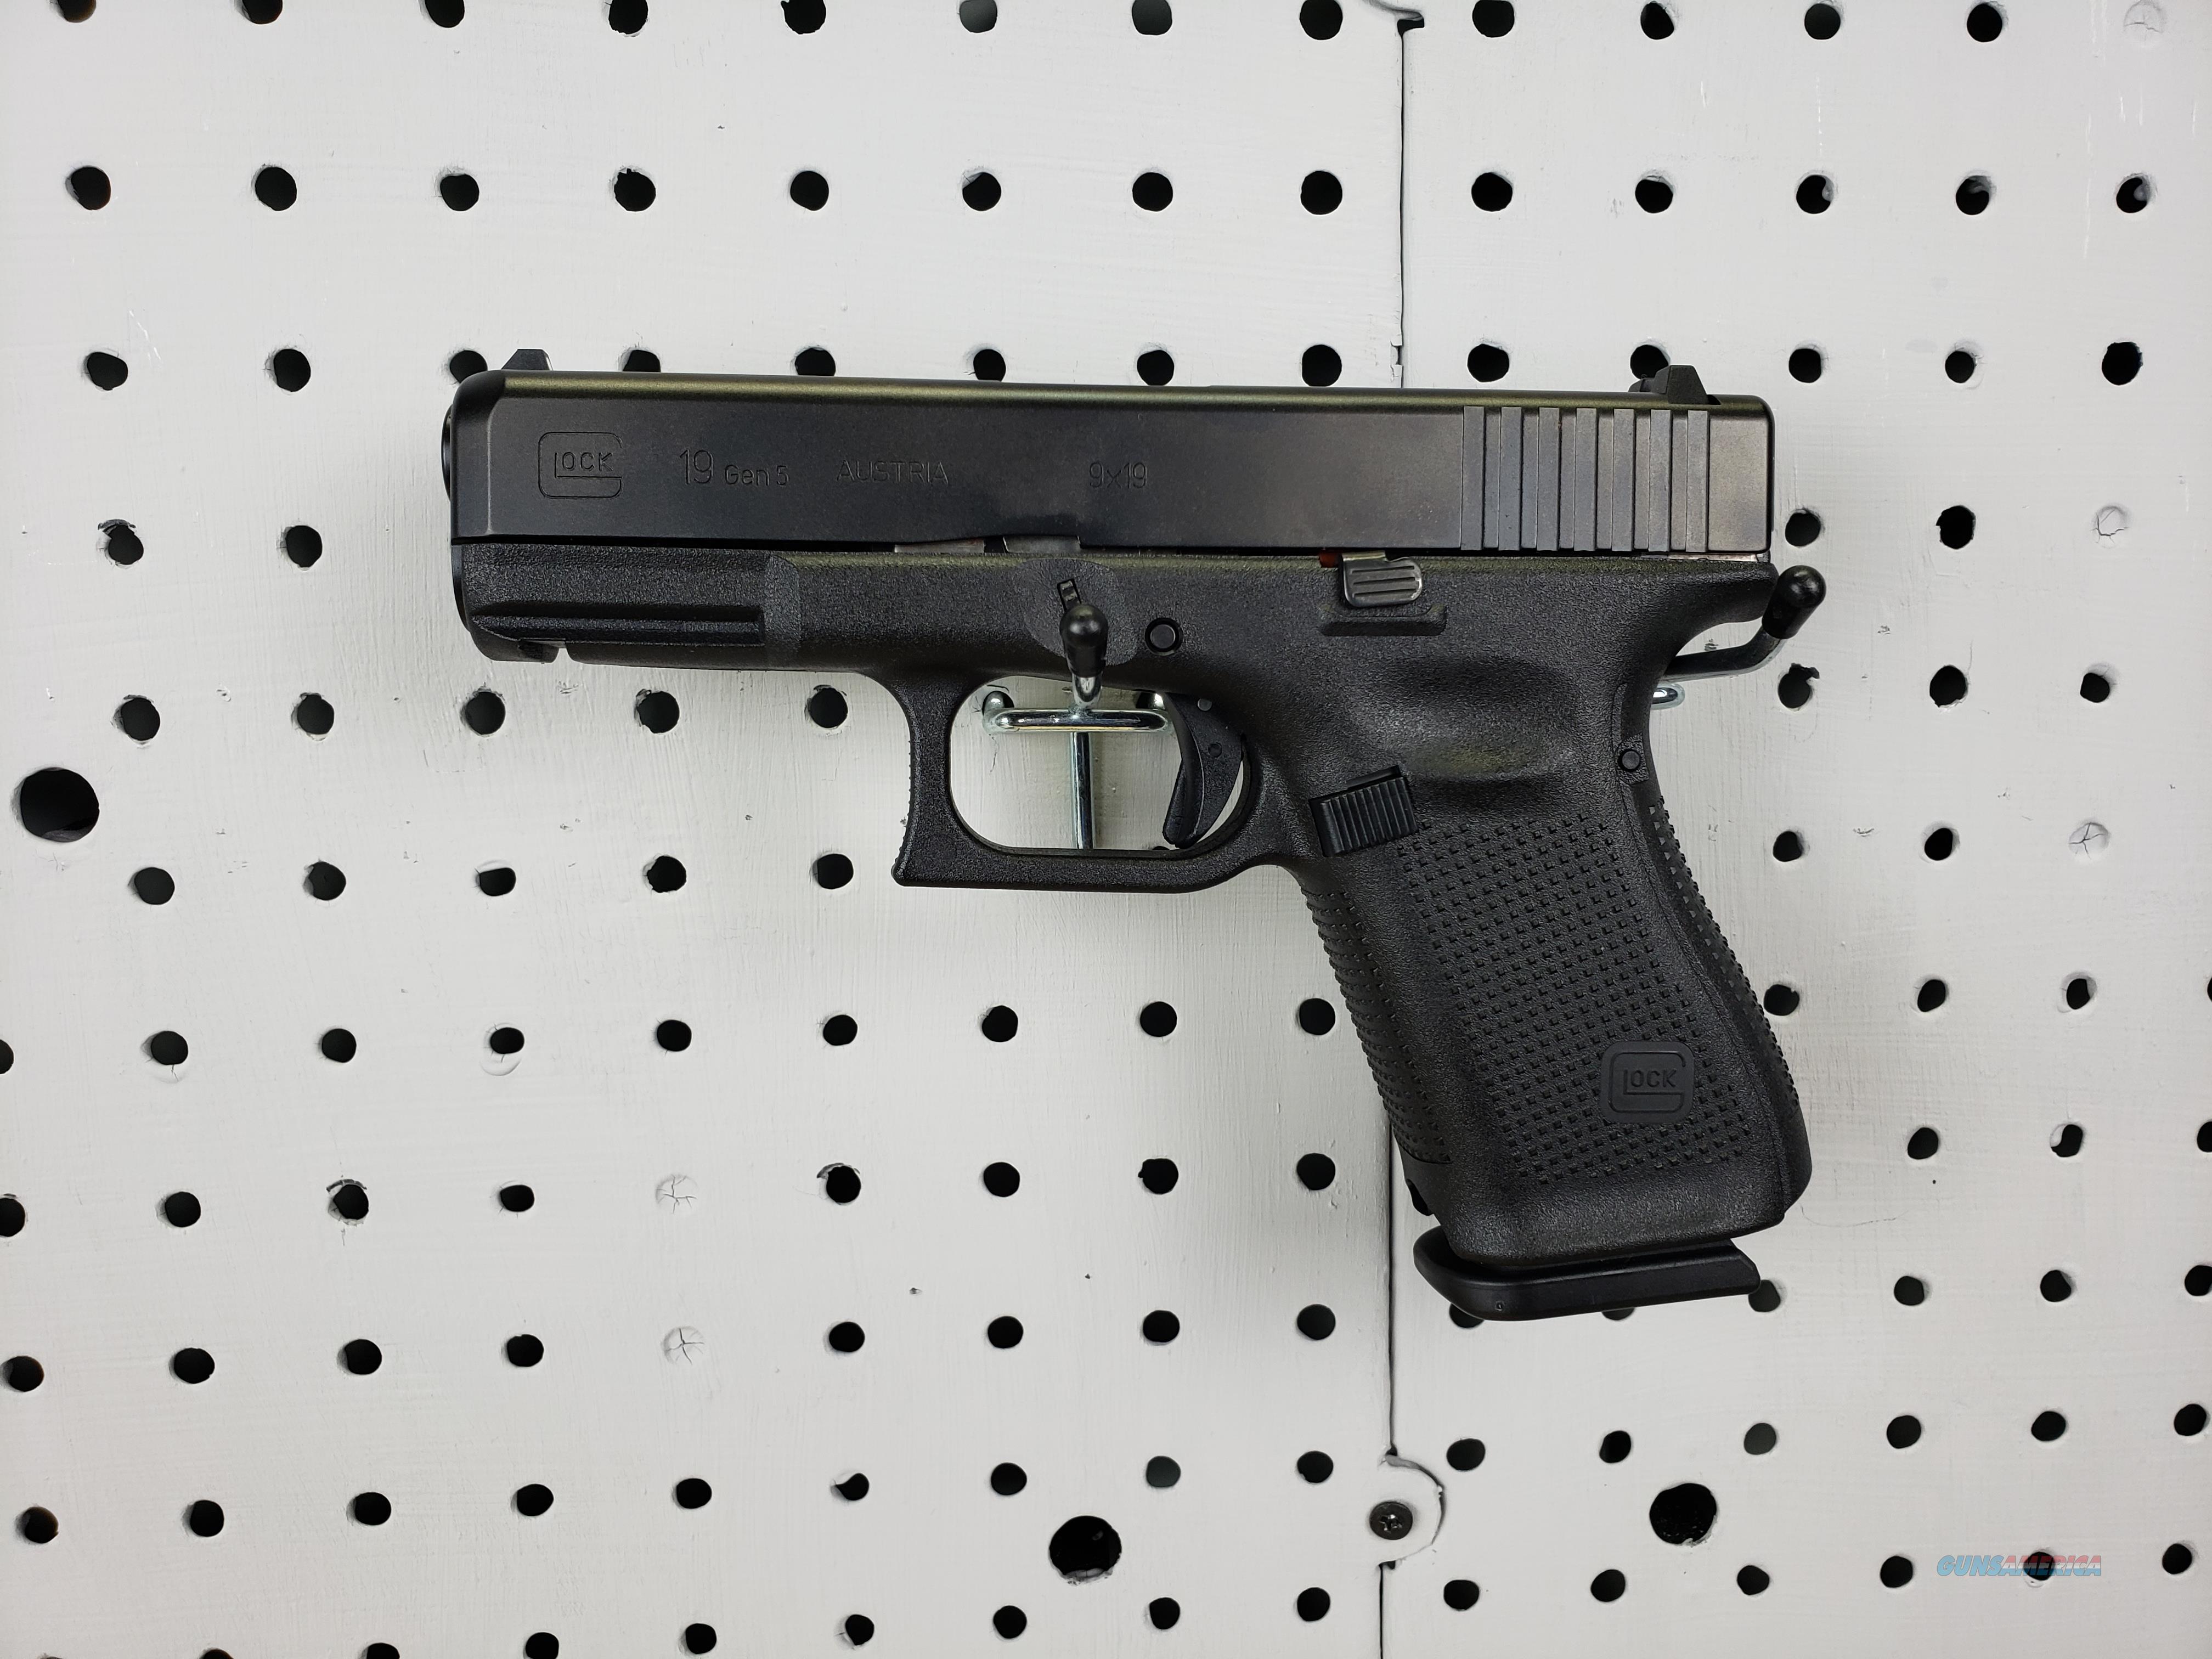 Glock Gen 5 19 Pistol Comes With Free Glock BackPack  Guns > Pistols > Glock Pistols > 19